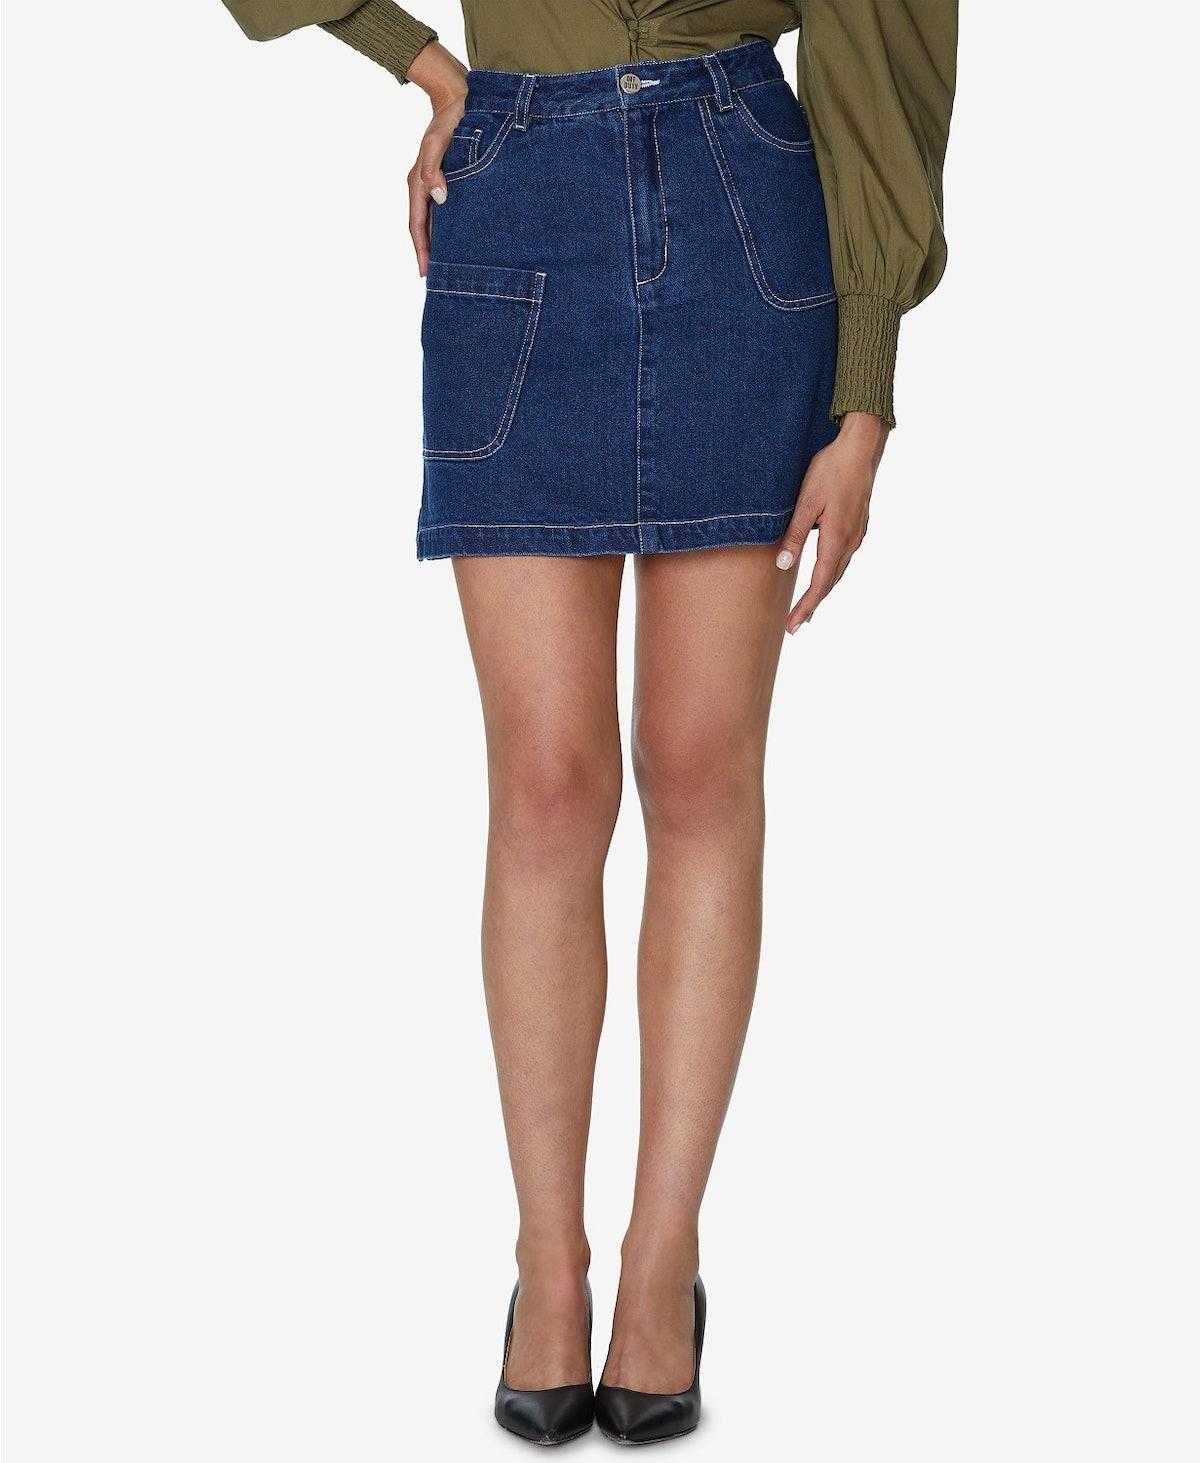 INSPR x Natalie Off Duty Denim Mini Skirt